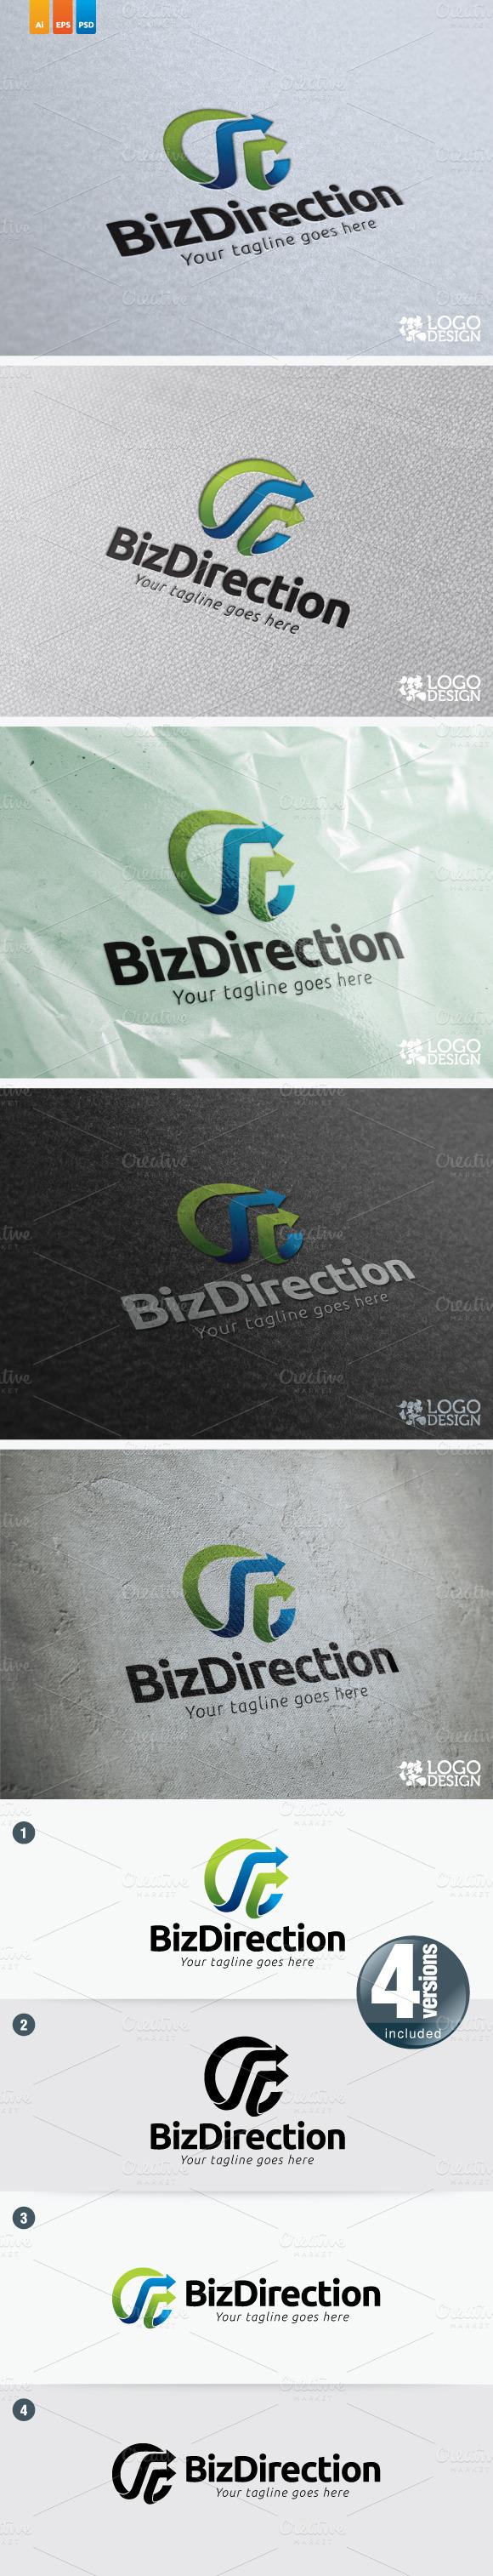 Biz Direction